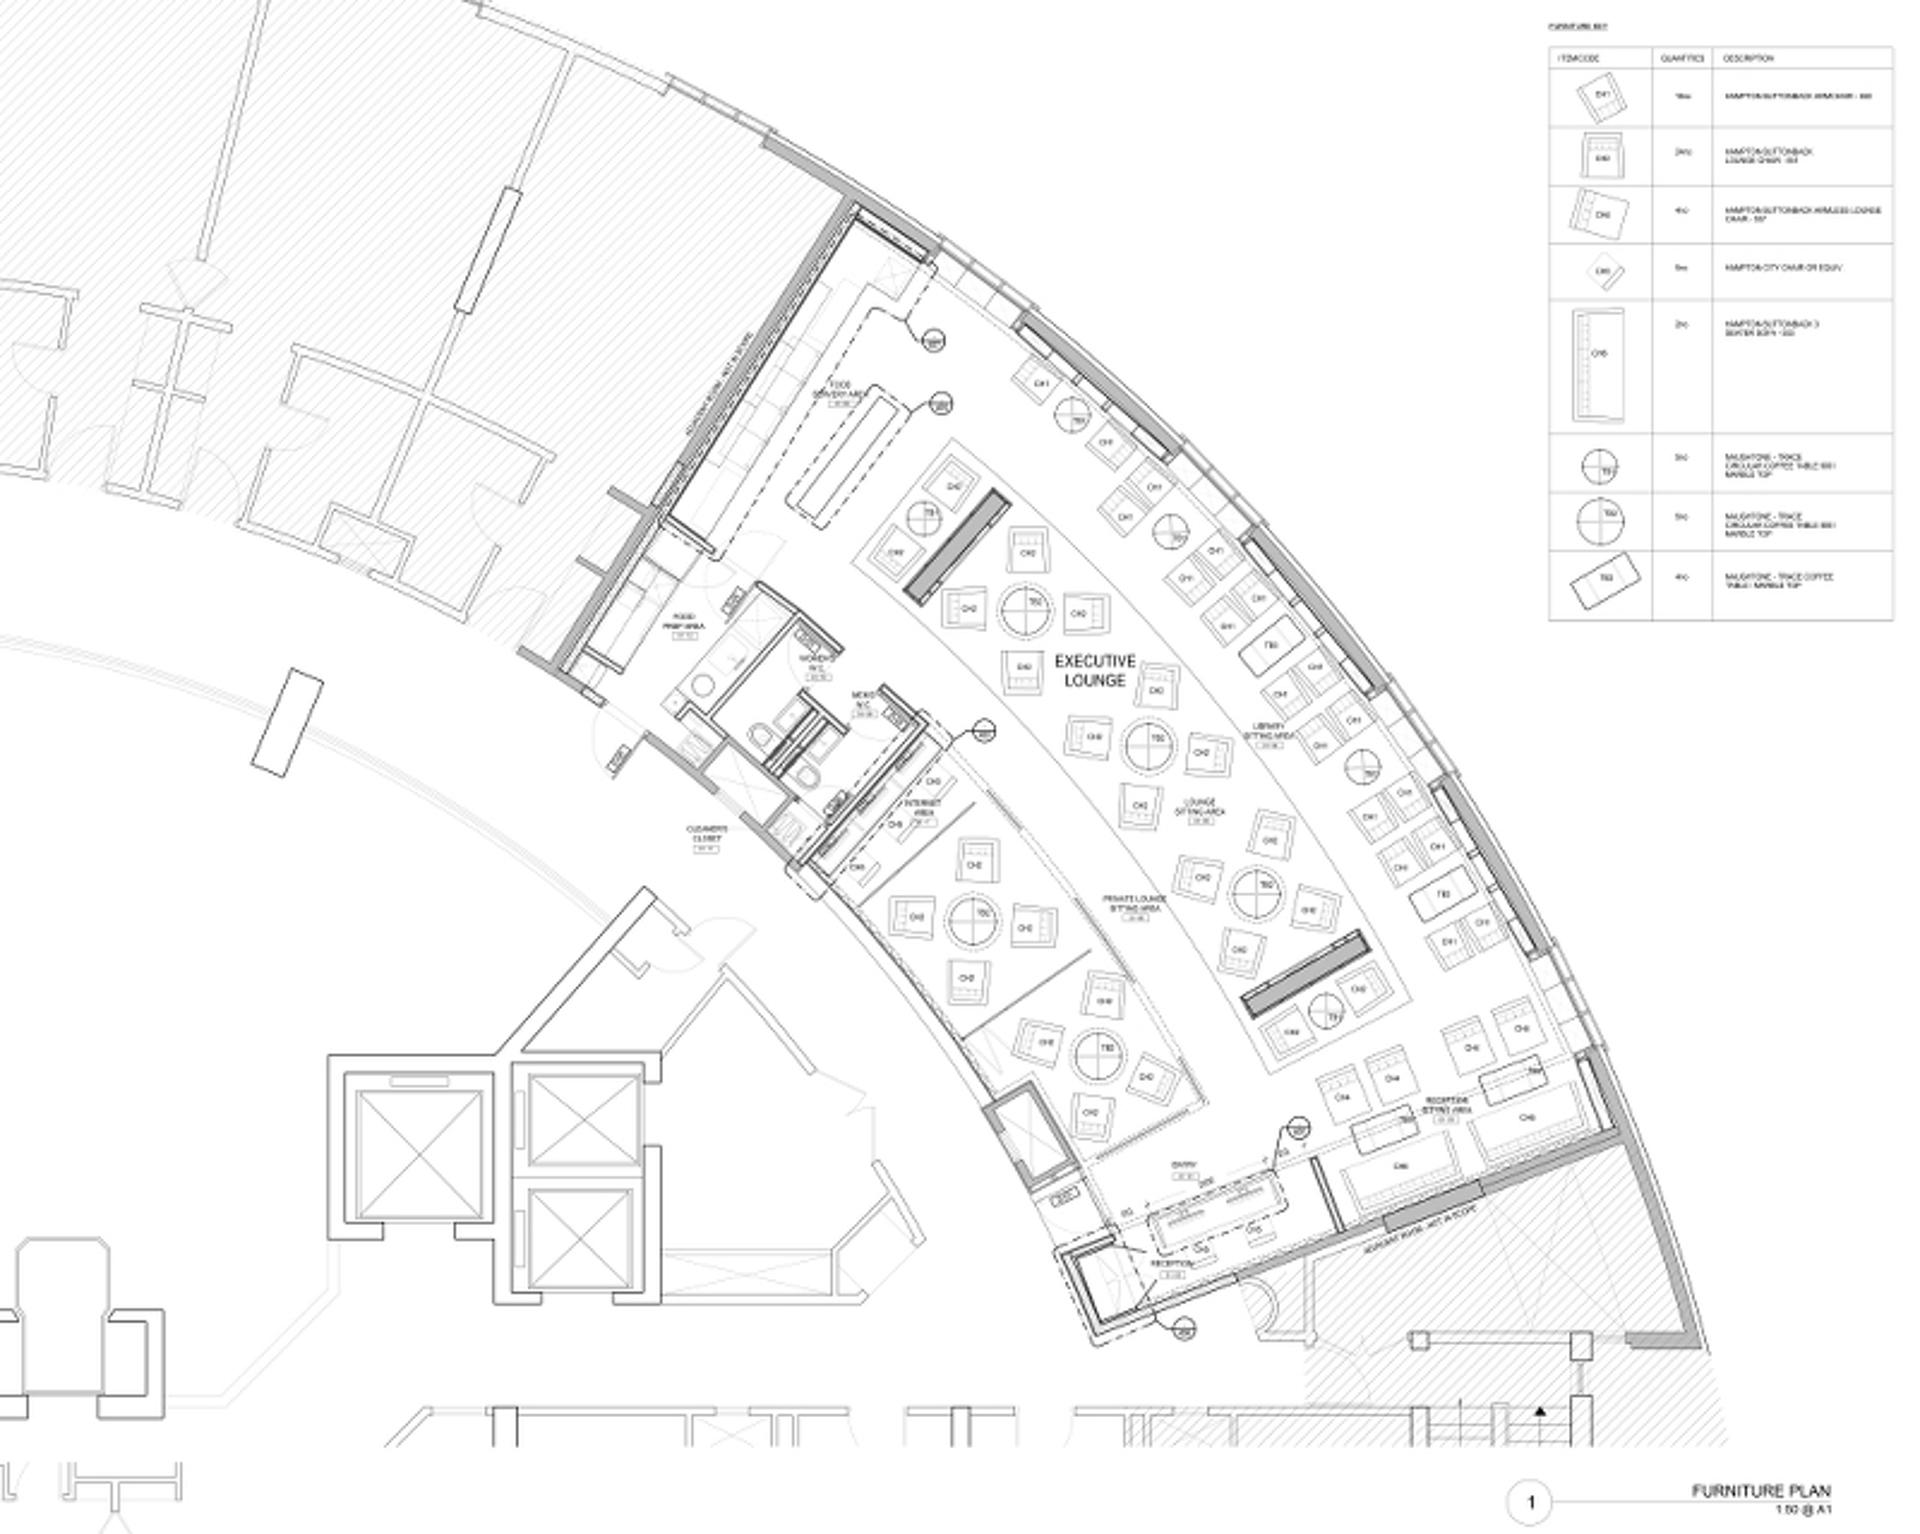 Hilton Executive Lounge Furniture Plan